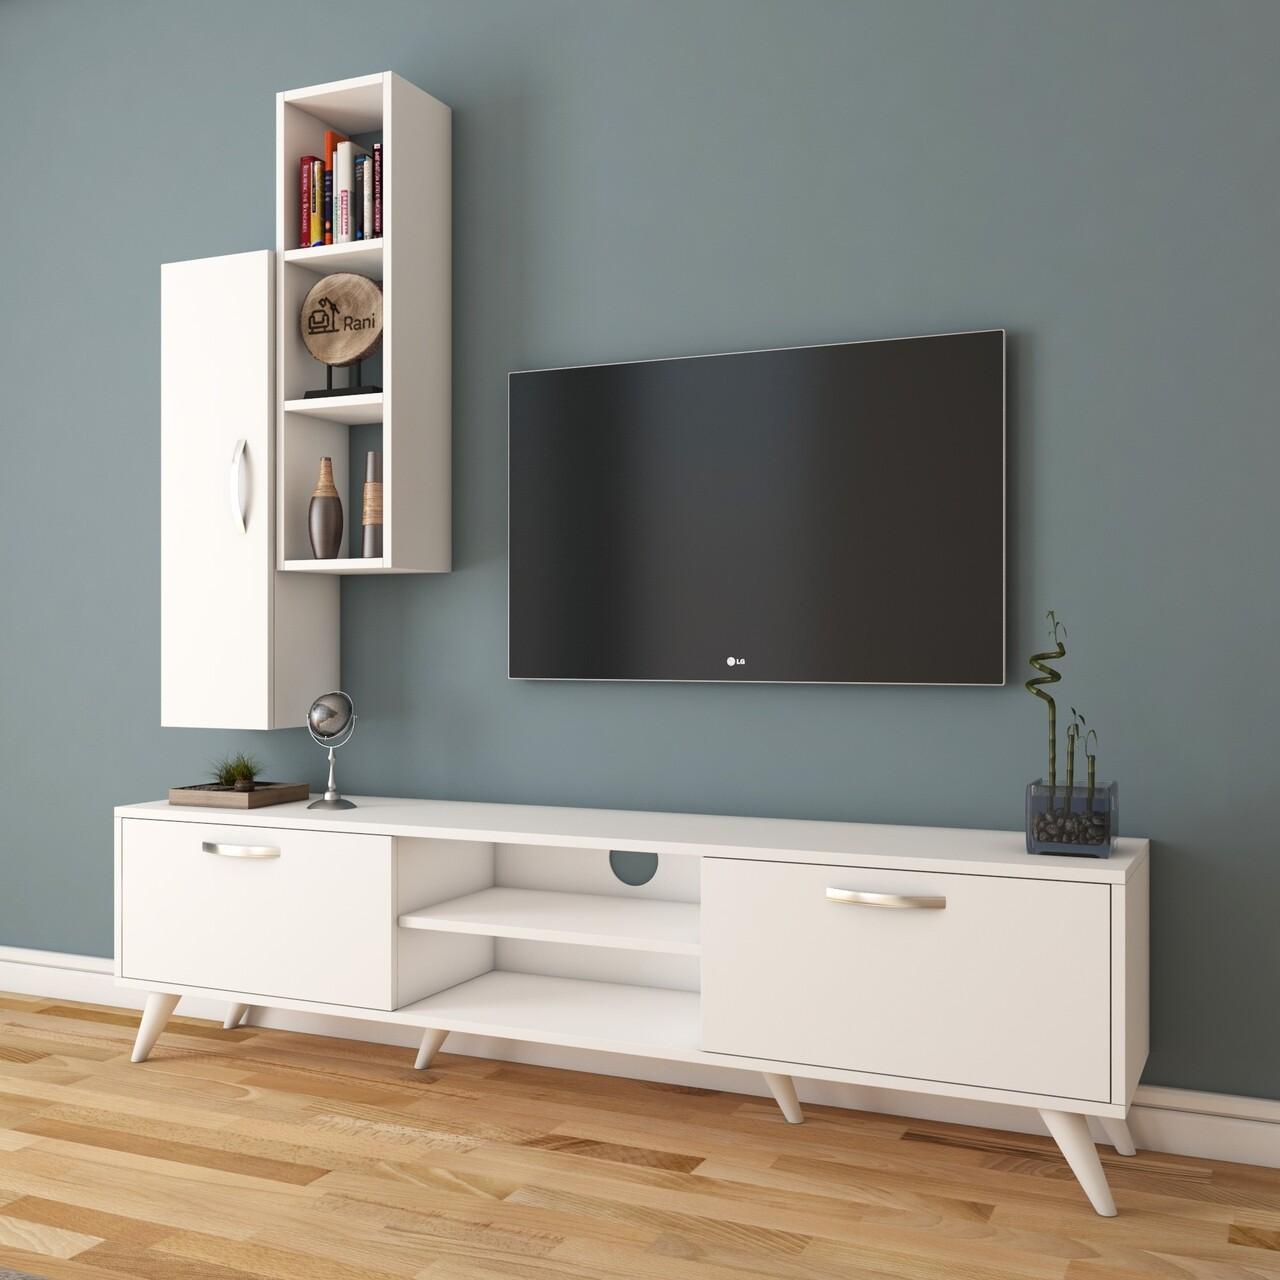 Comoda TV cu raft de perete si cabinet M1 - 228, Wren, 180 x 35 x 48.6 cm/90 cm, white